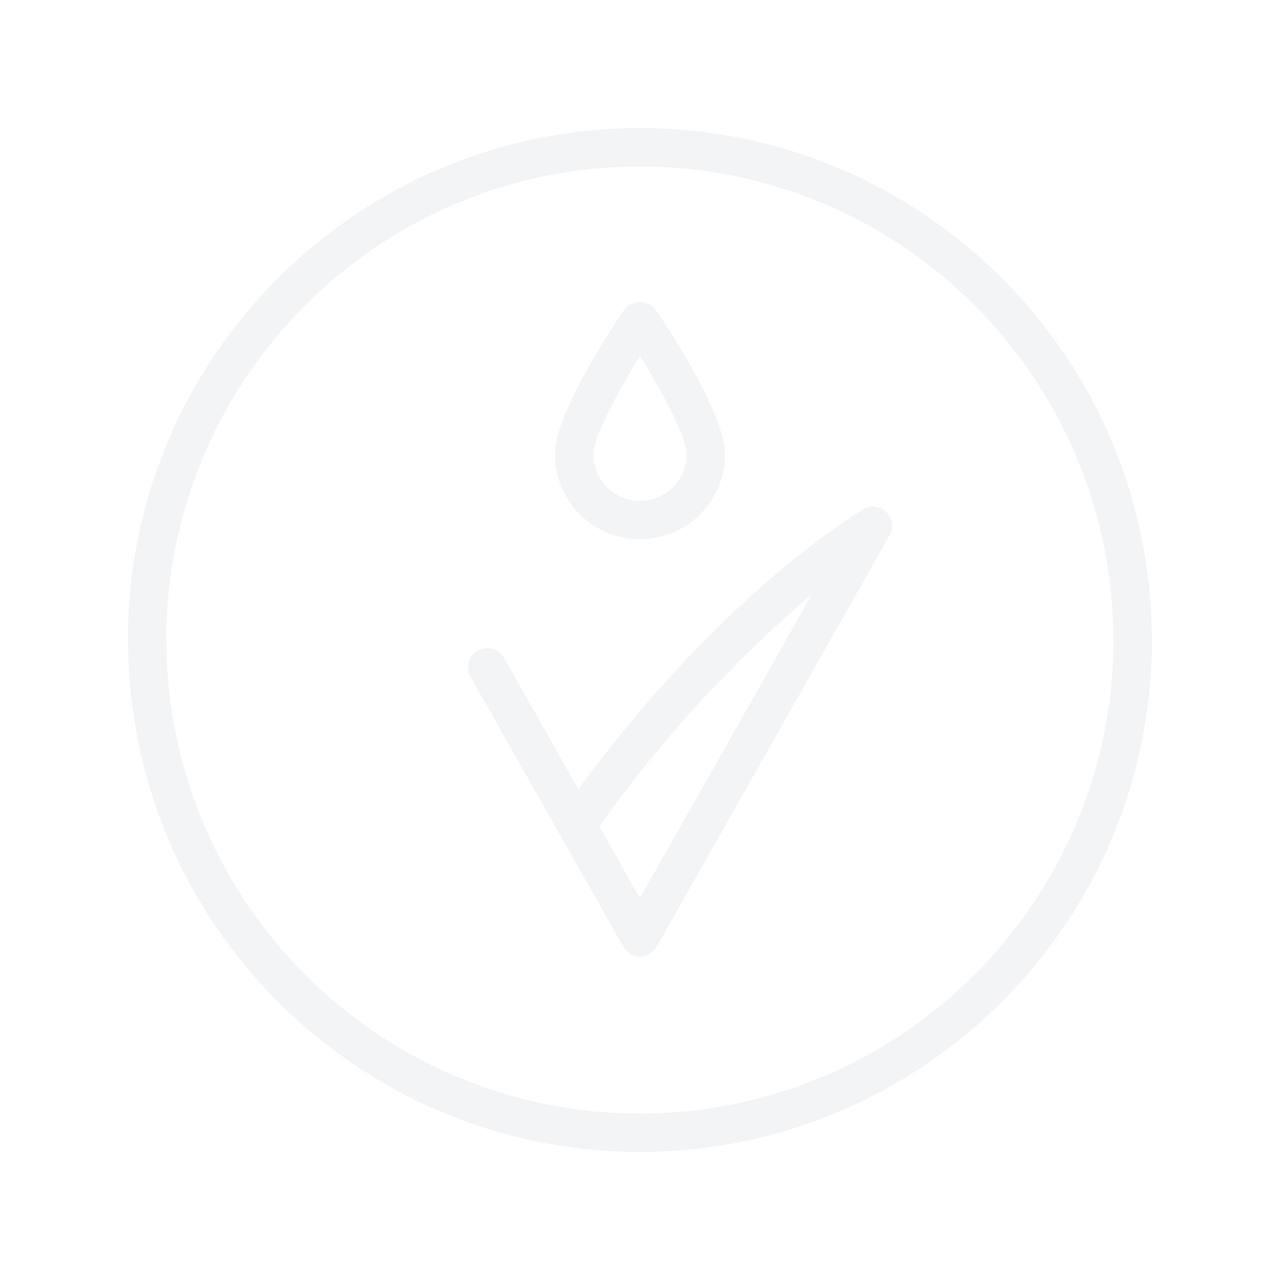 HOLIKA HOLIKA Charcoal Modeling Mask 200g альгинатная маска для лица